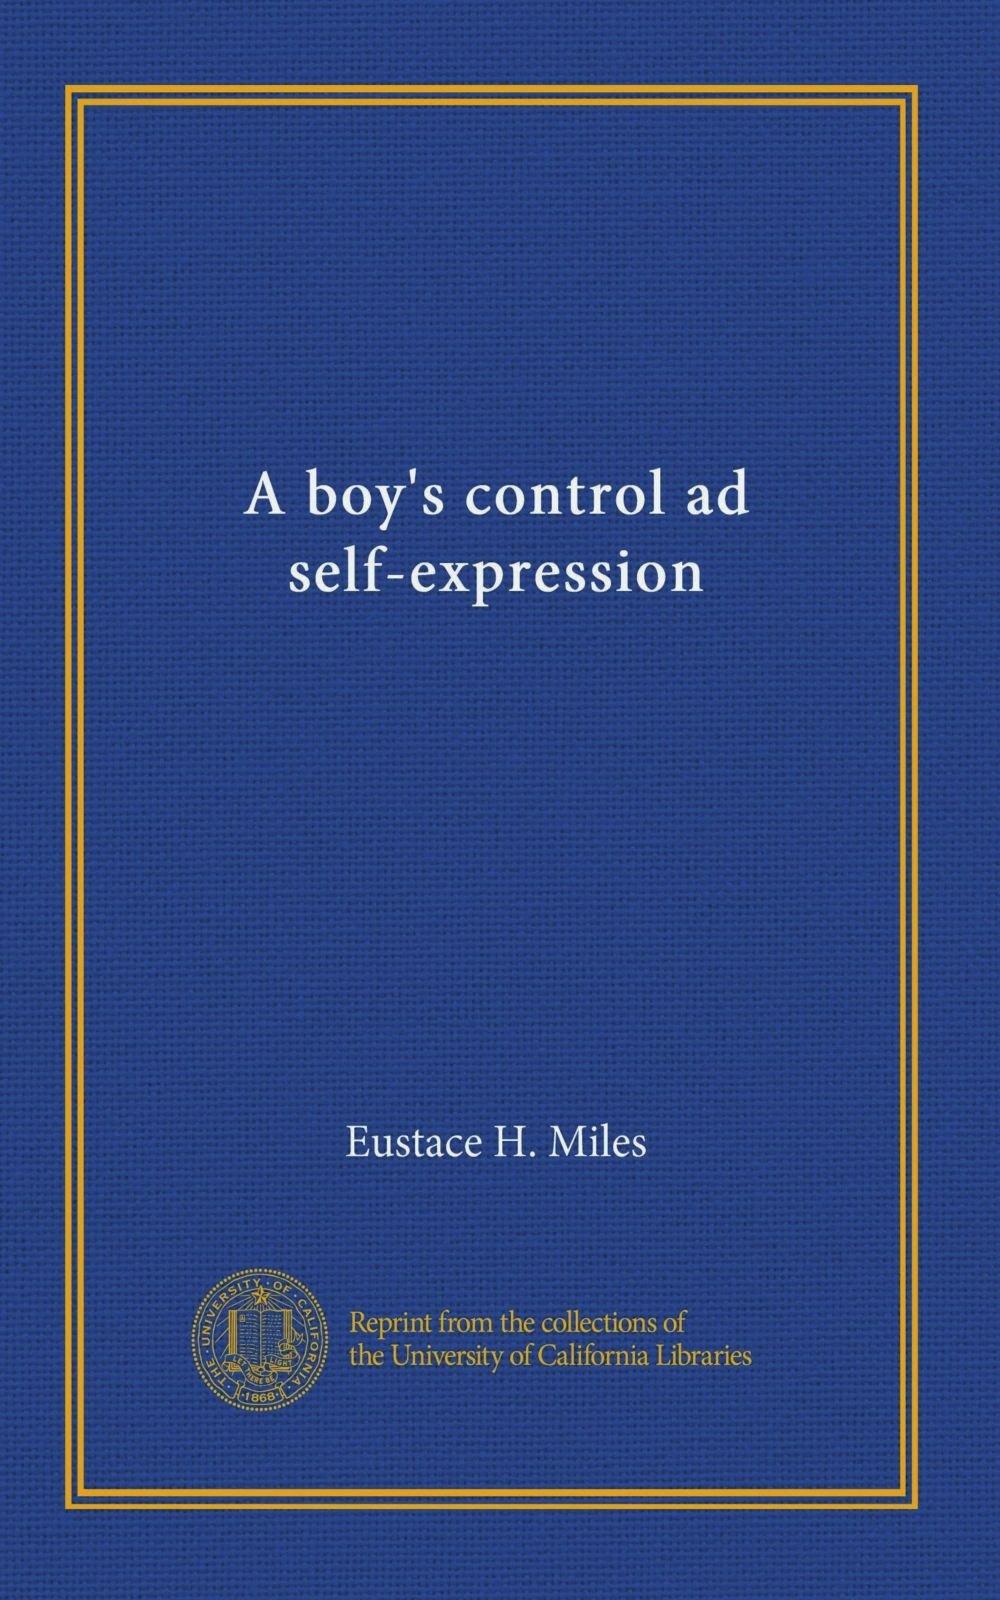 Download A boy's control ad self-expression ebook